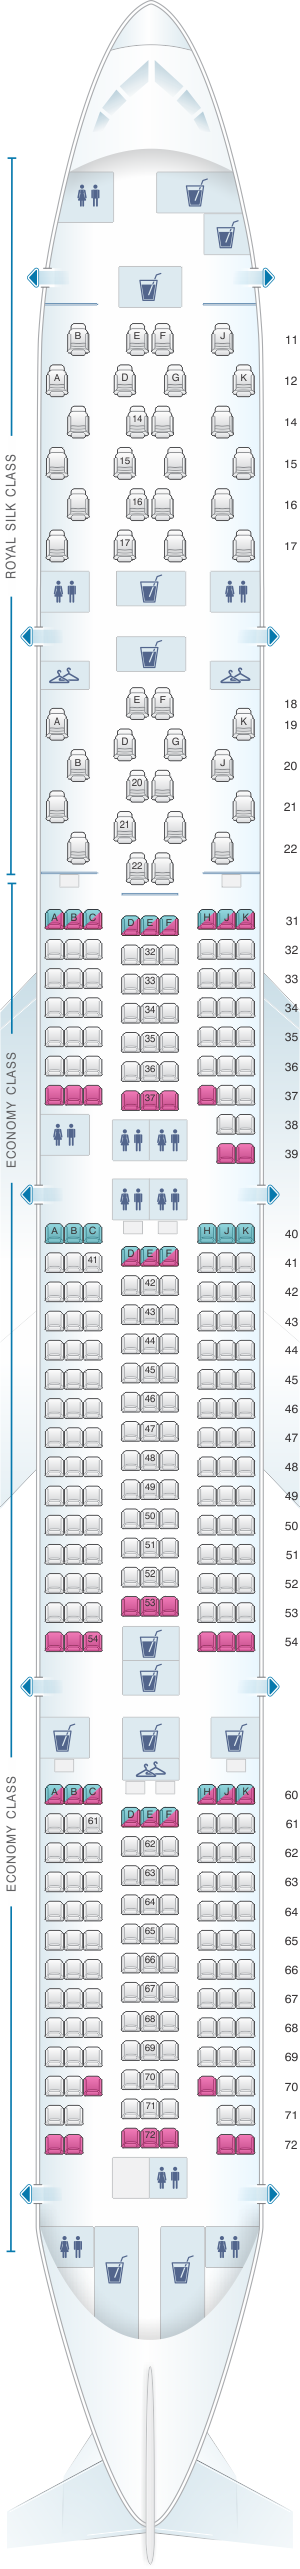 Seat map for Thai Airways International Boeing B777 300ER